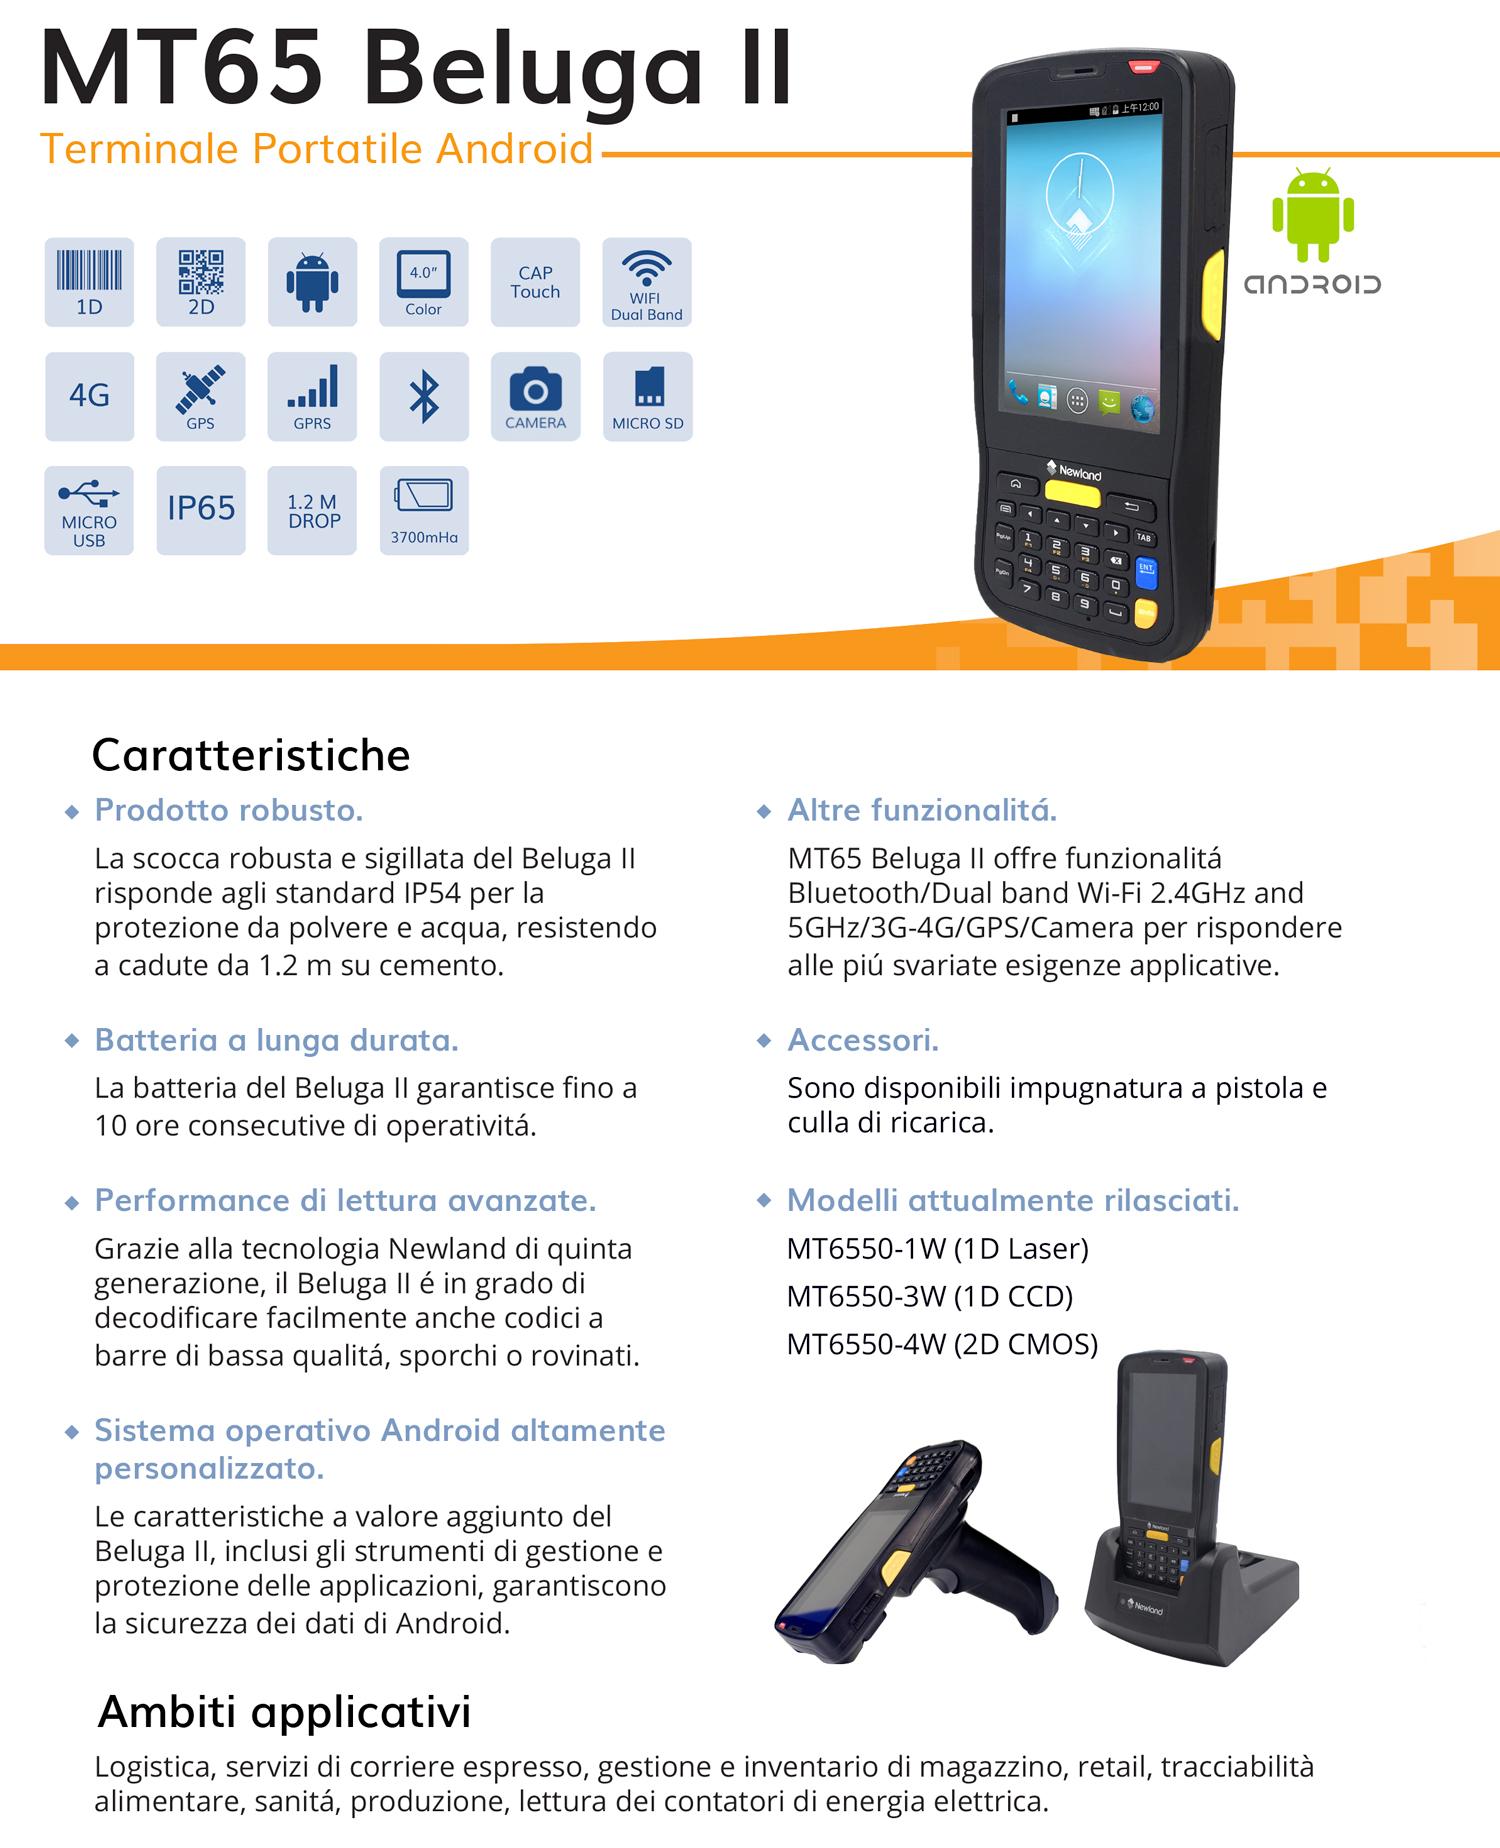 MT65-Beluga-II-datasheet-italian-1